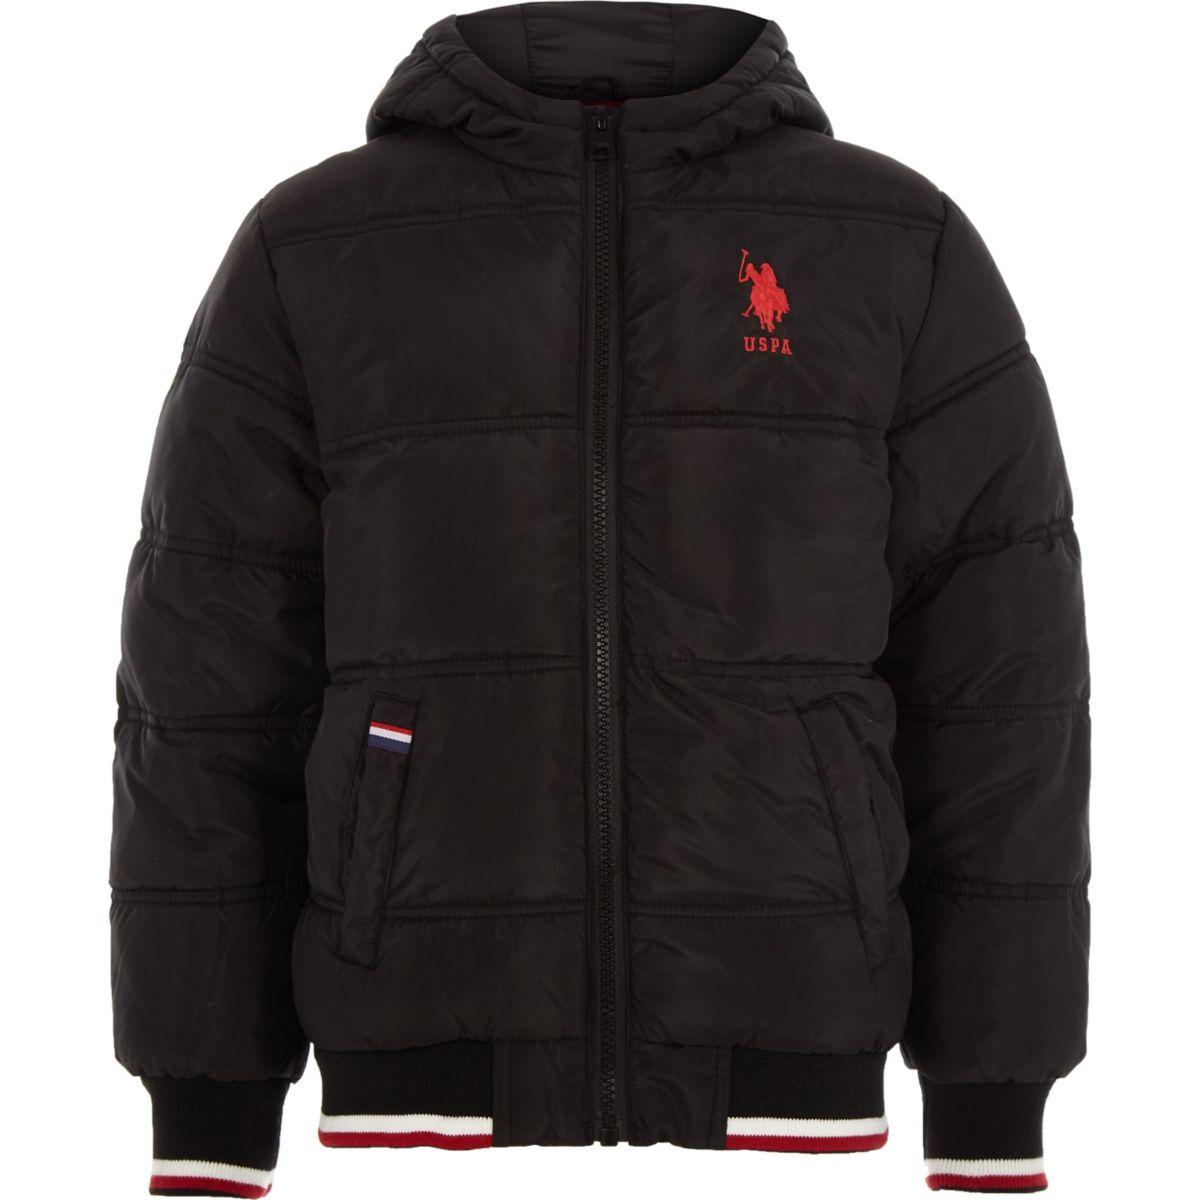 Boys U.S. Polo Assn. black puffer jacket